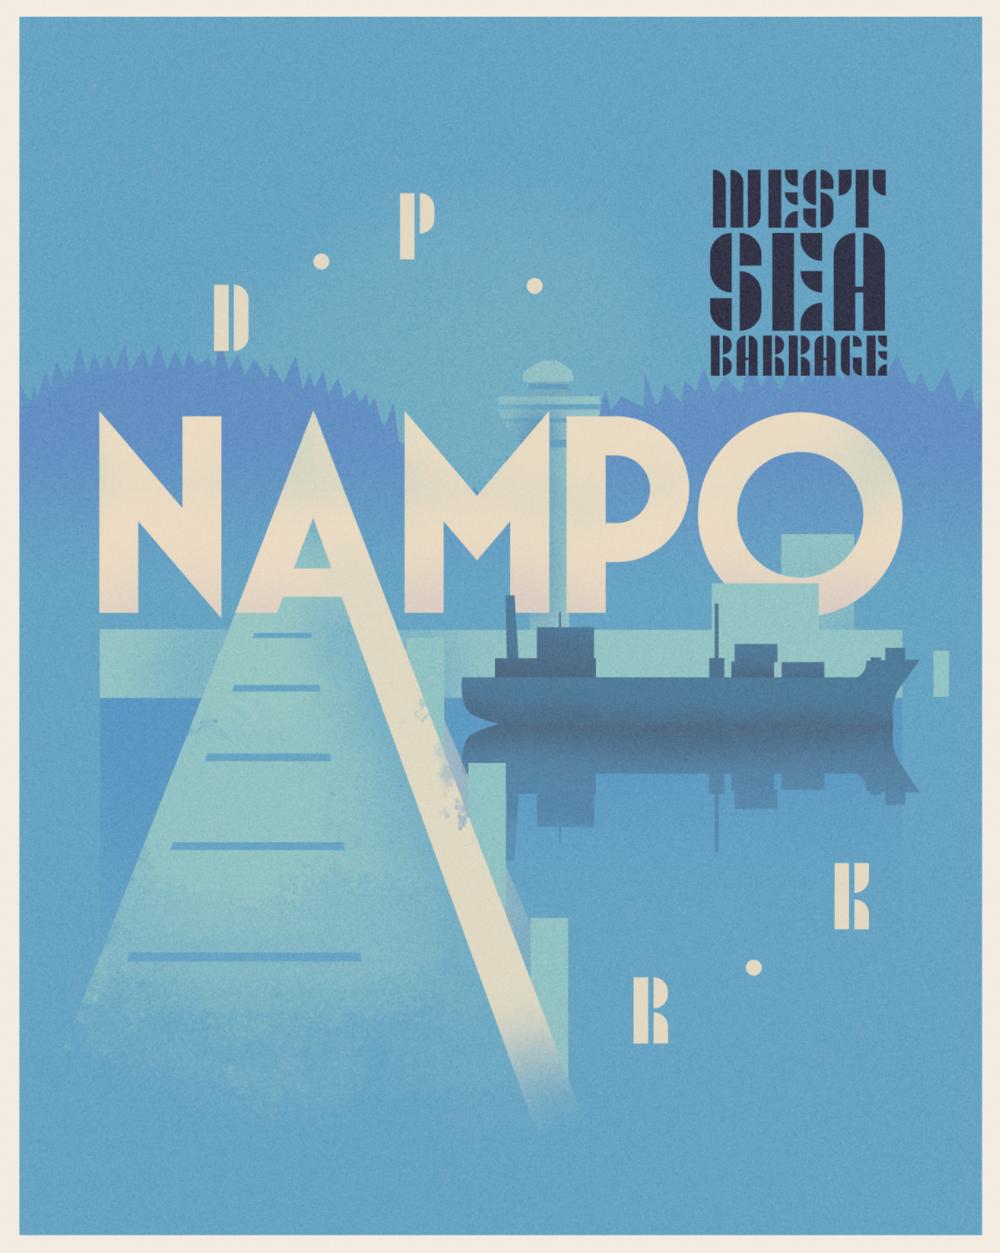 nampo